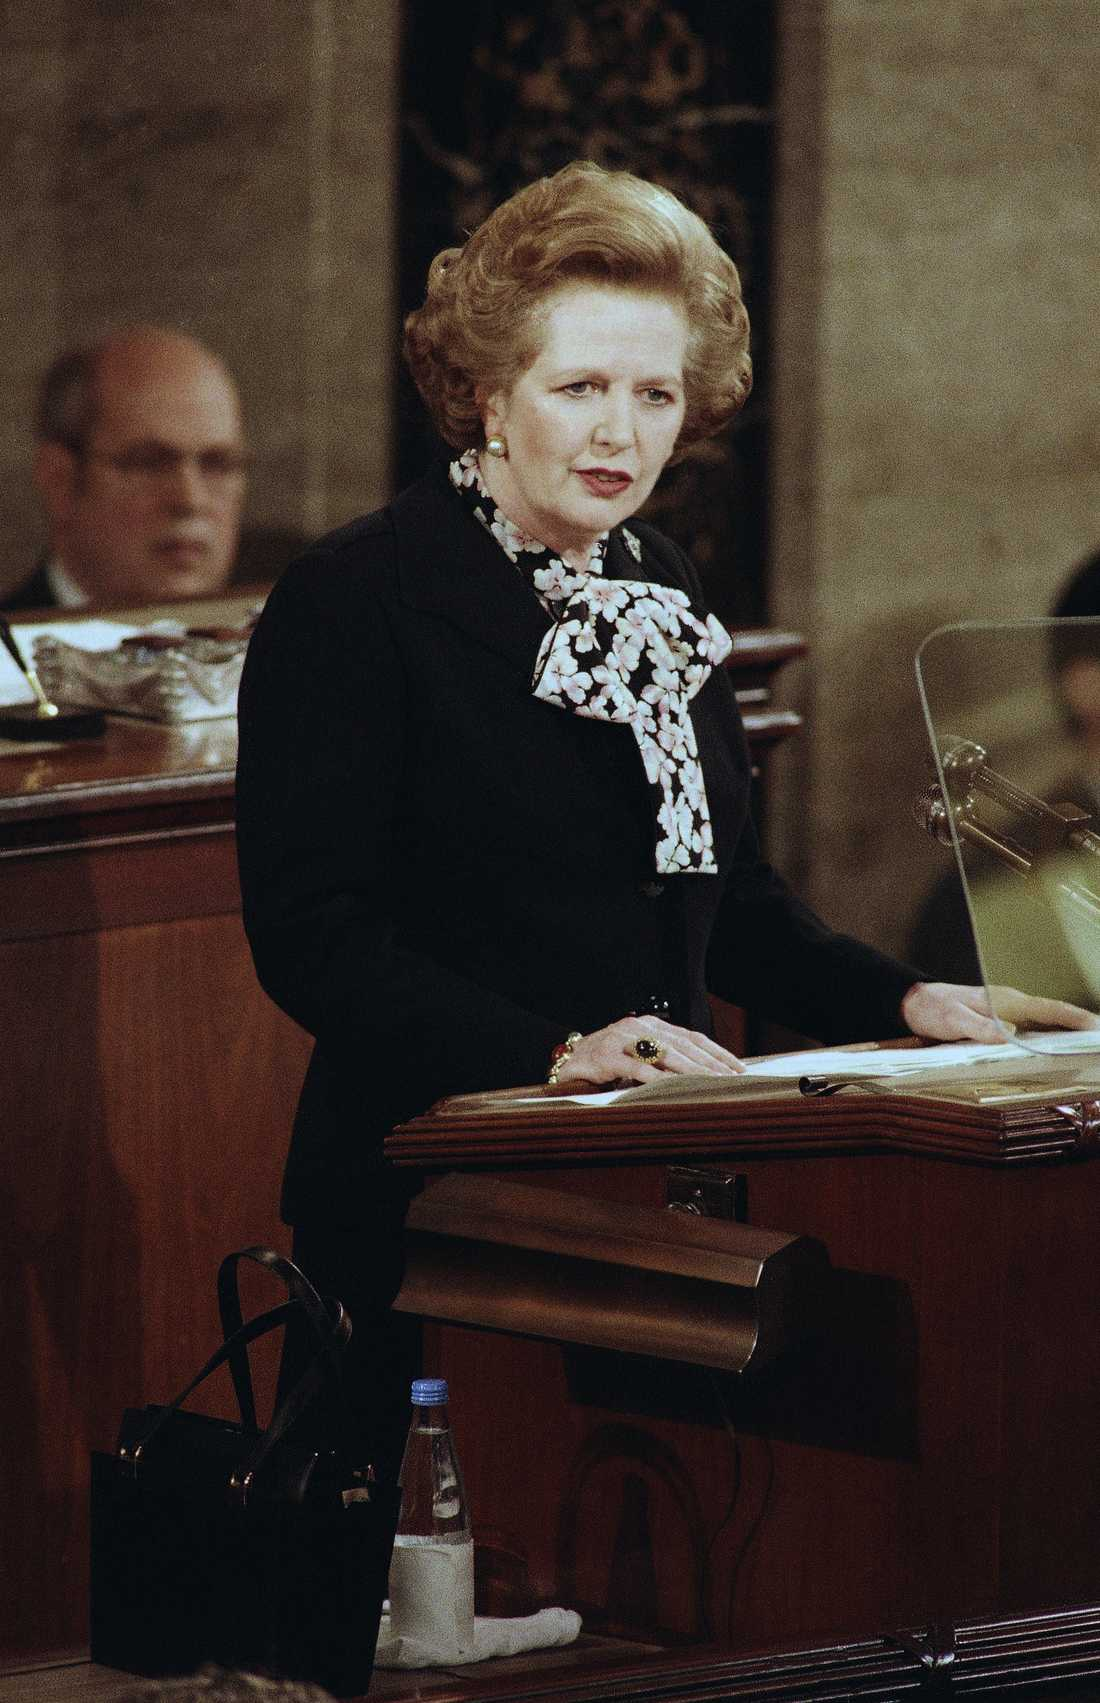 Margaret Thatcher brukade också bära knytblus ofta.